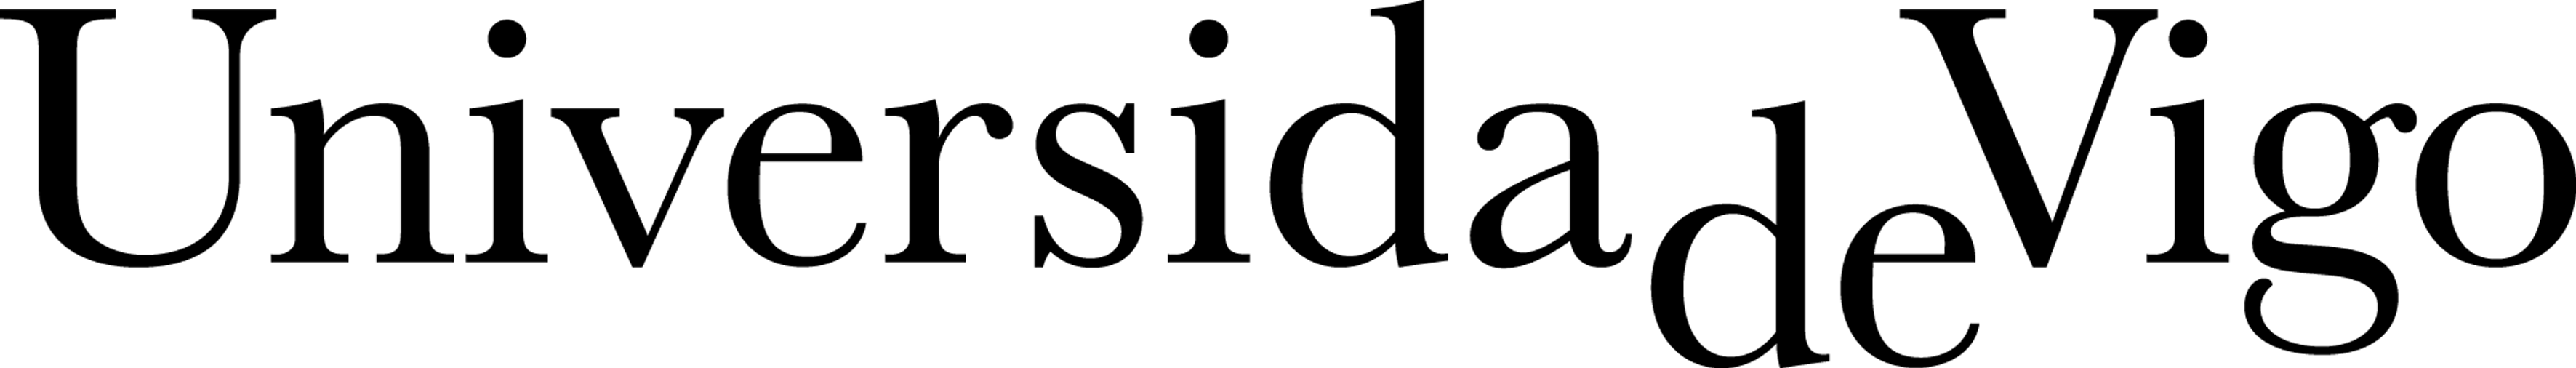 Universidad de Vigo logotipo